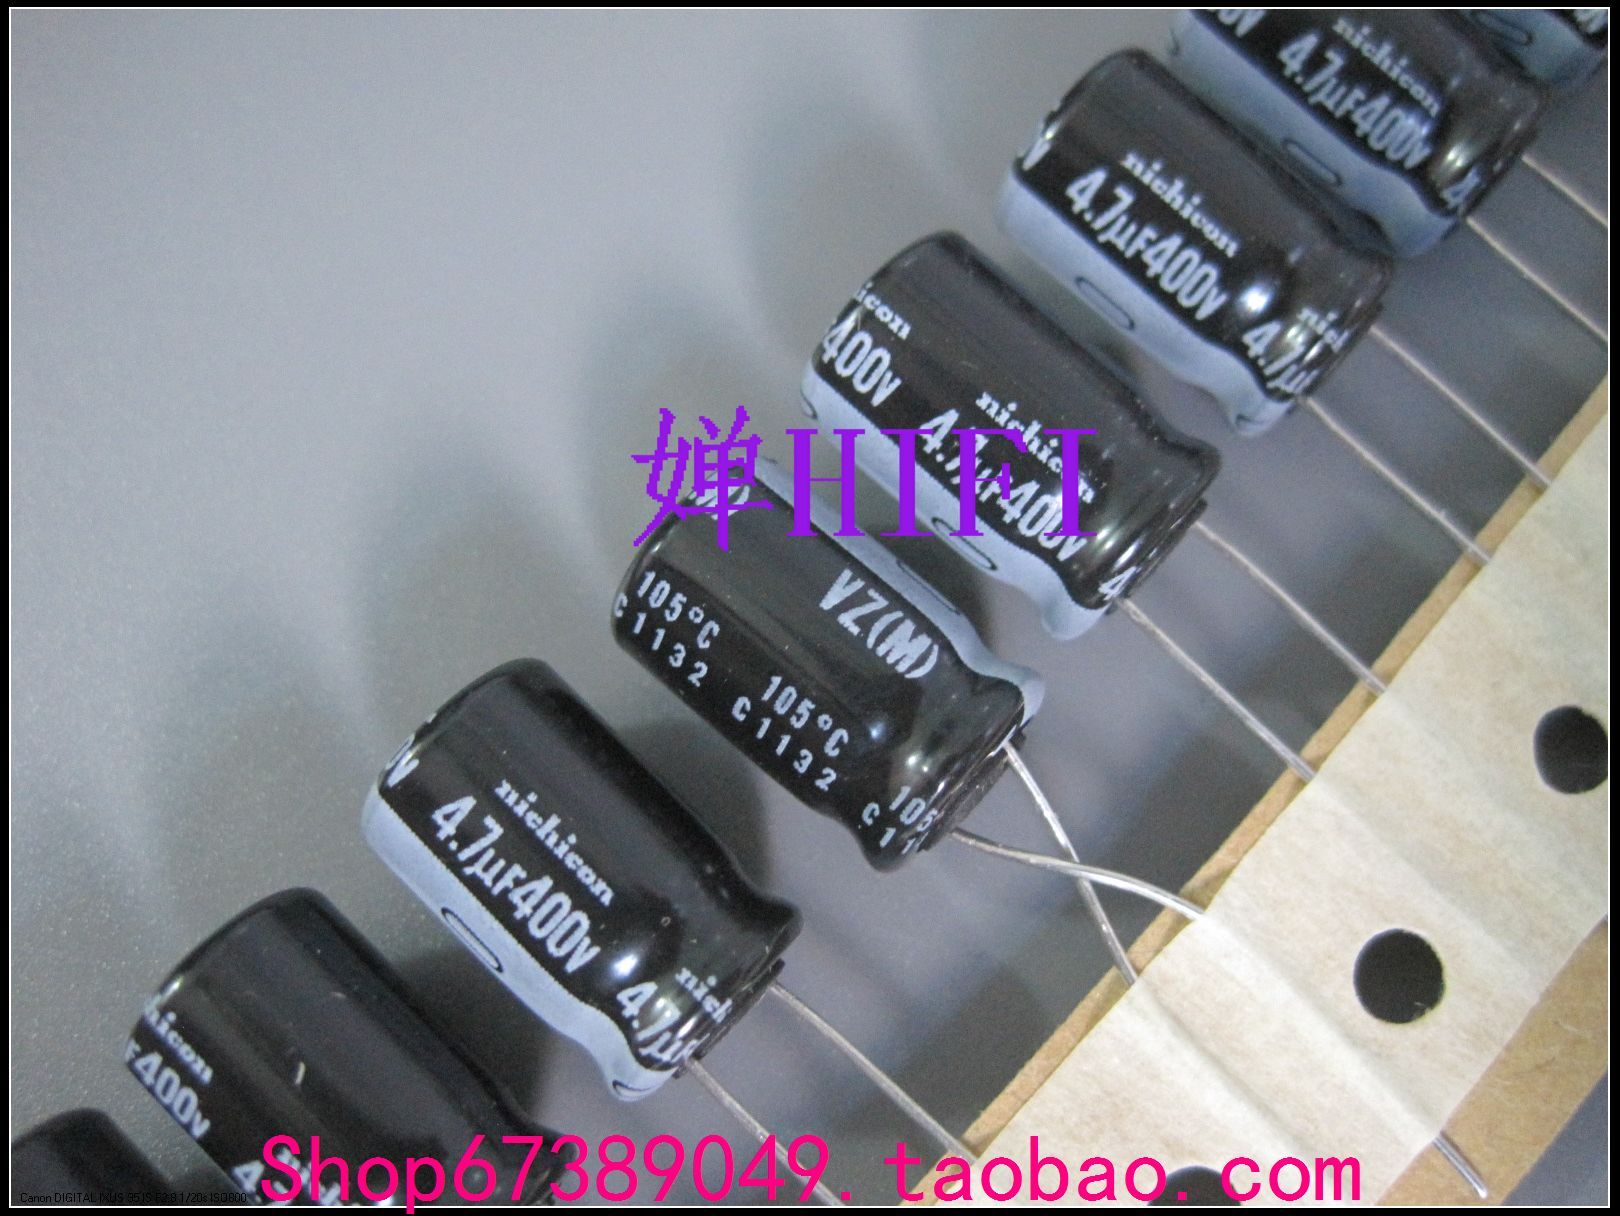 electrolytic capacitor 50pcs Japanese original VZ electrolytic capacitor 400v4.7uf 10x16mm free shipping (1)